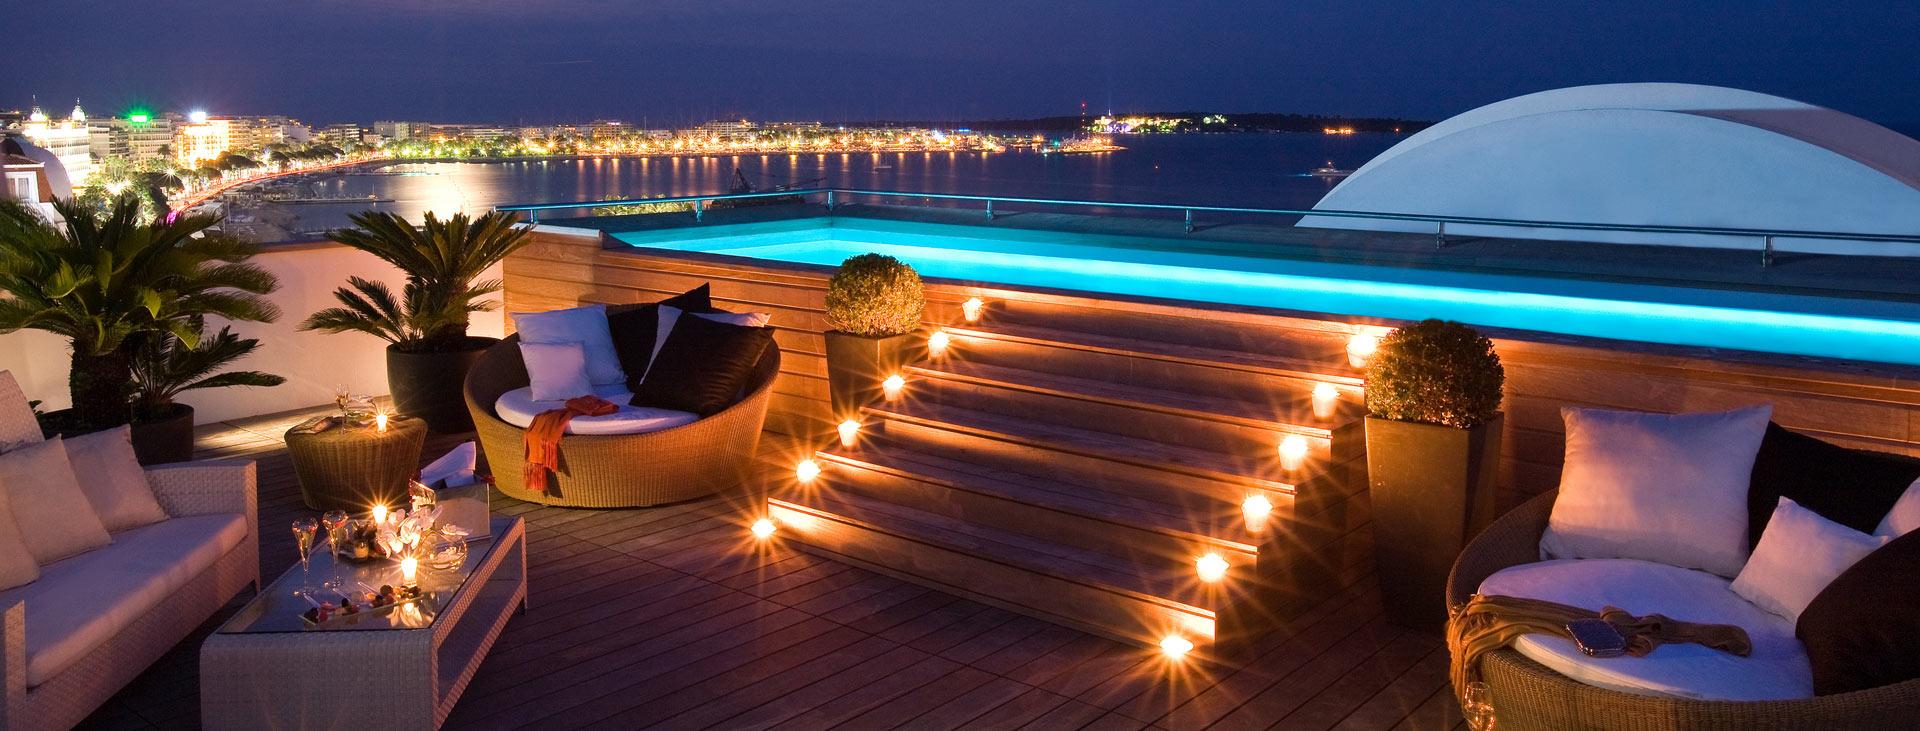 Barrière Le Majestic Cannes, Cannes, Franska rivieran, Frankrike